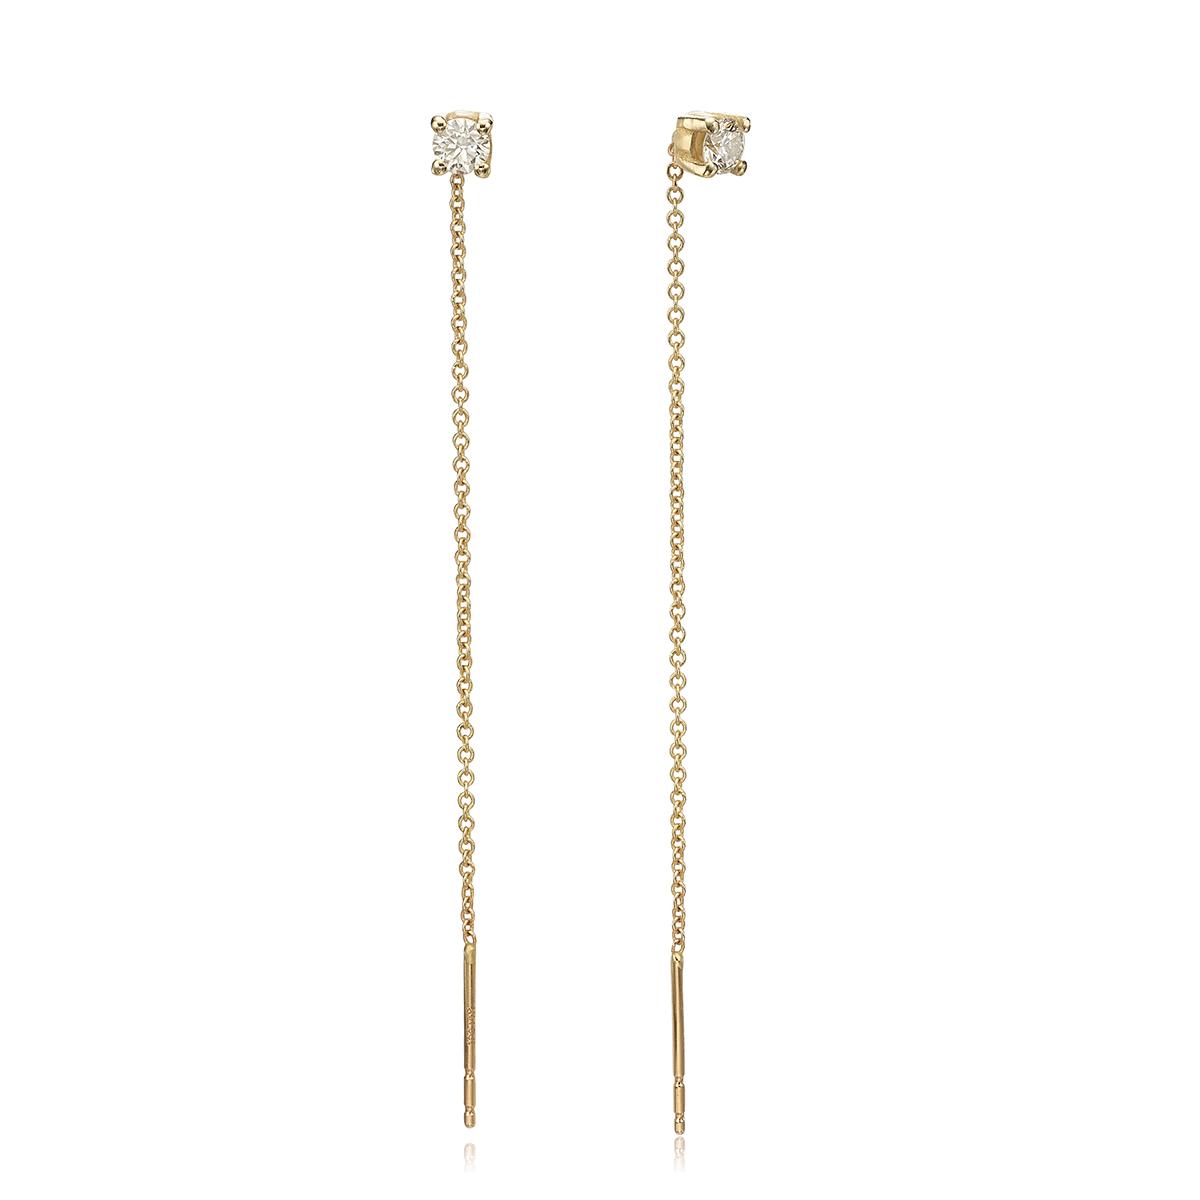 Diamond Chain Earrings – 0.30ct